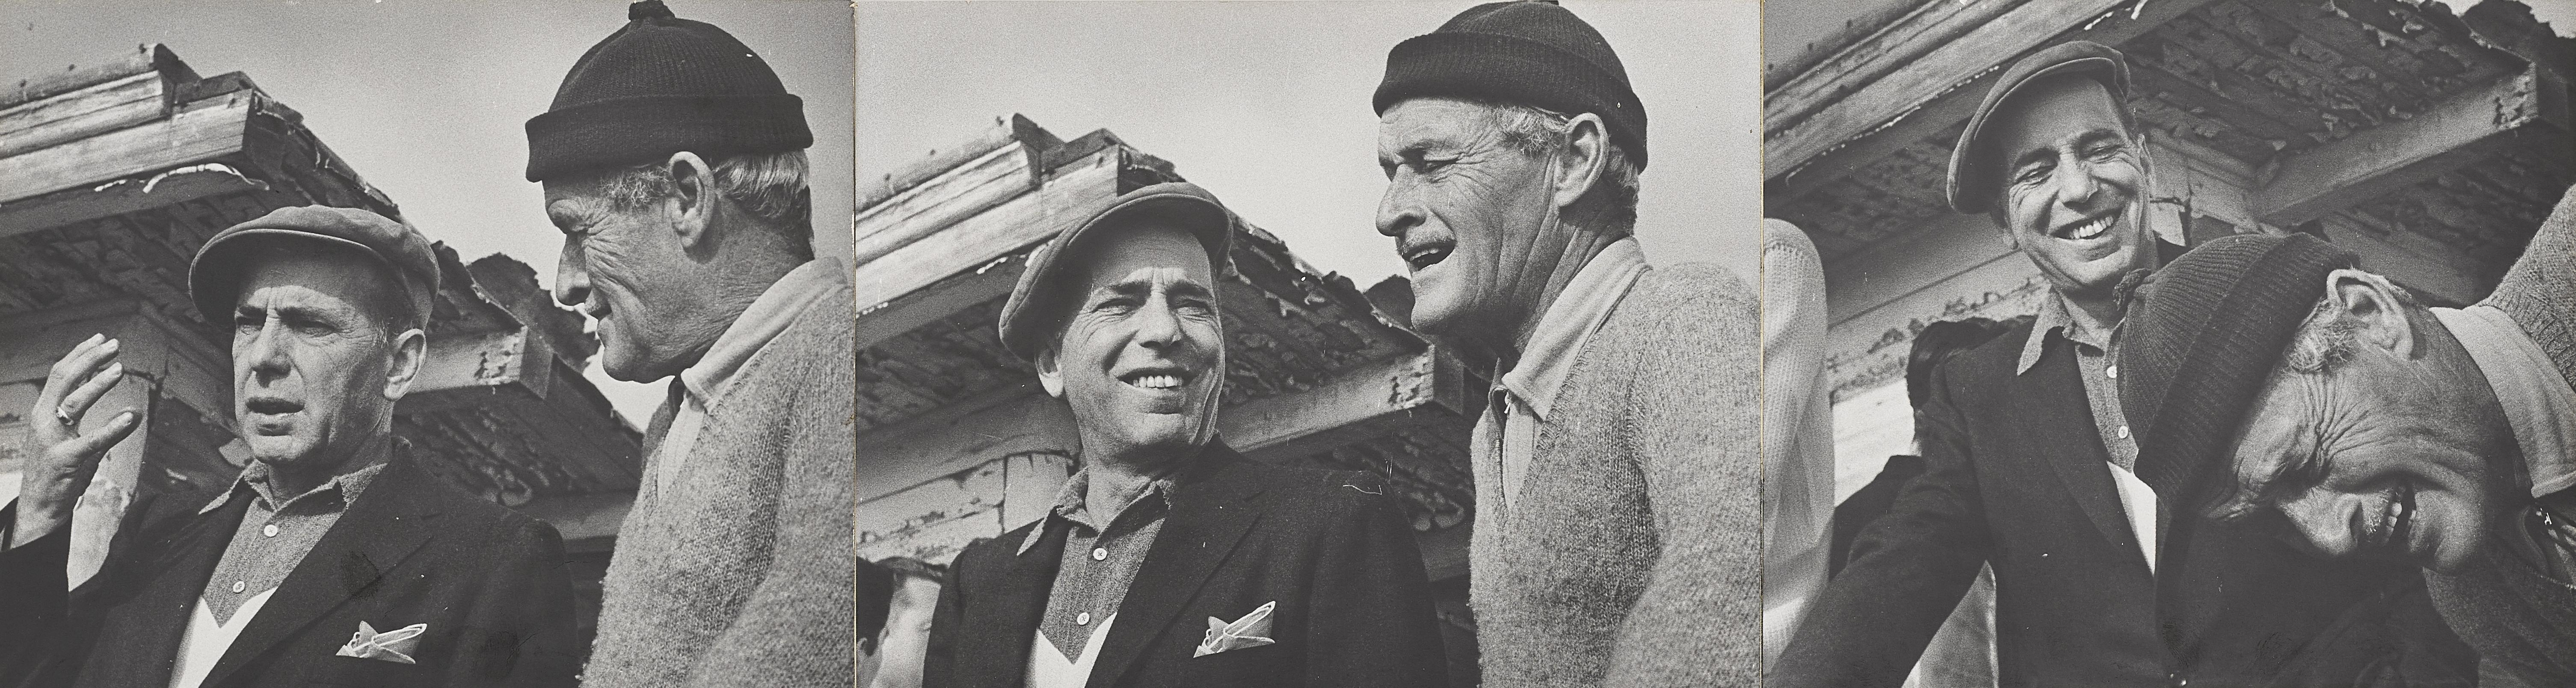 A Humphrey Bogart and William Wellman triptych taken by Phil Stern